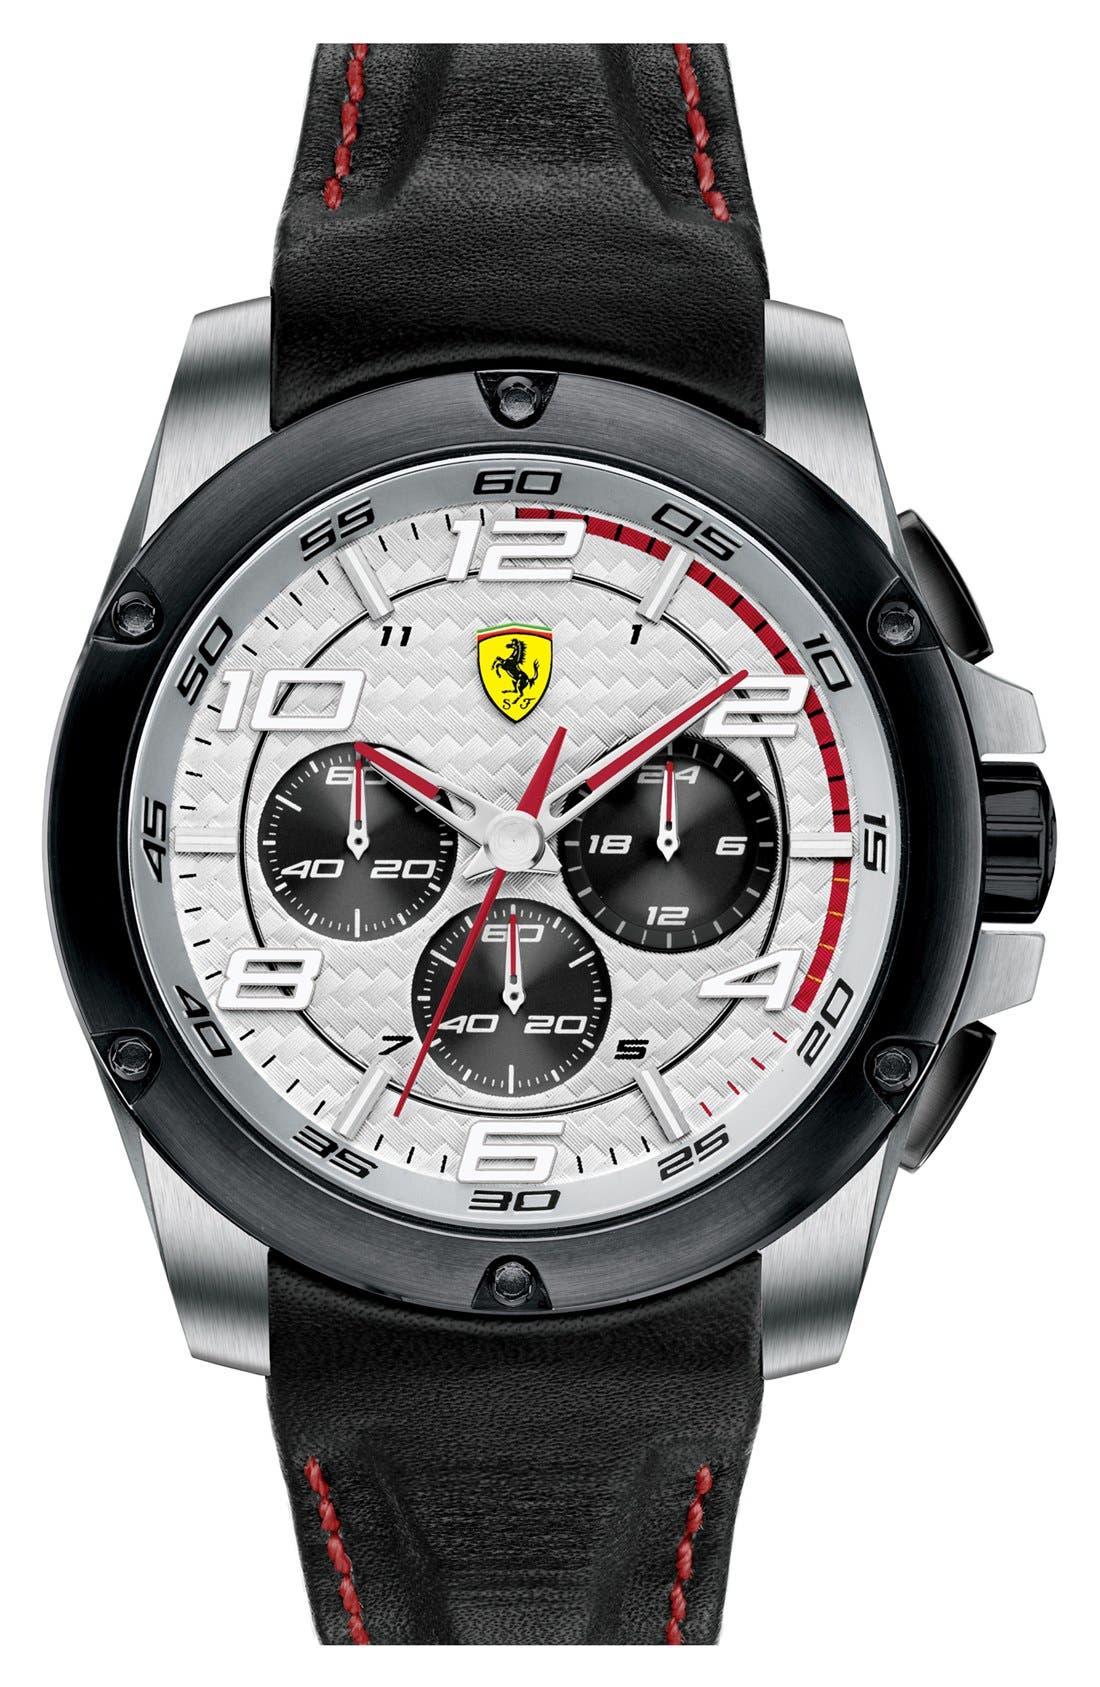 Main Image - Scuderia Ferrari 'Paddock' Chronograph Leather Strap Watch, 46mm